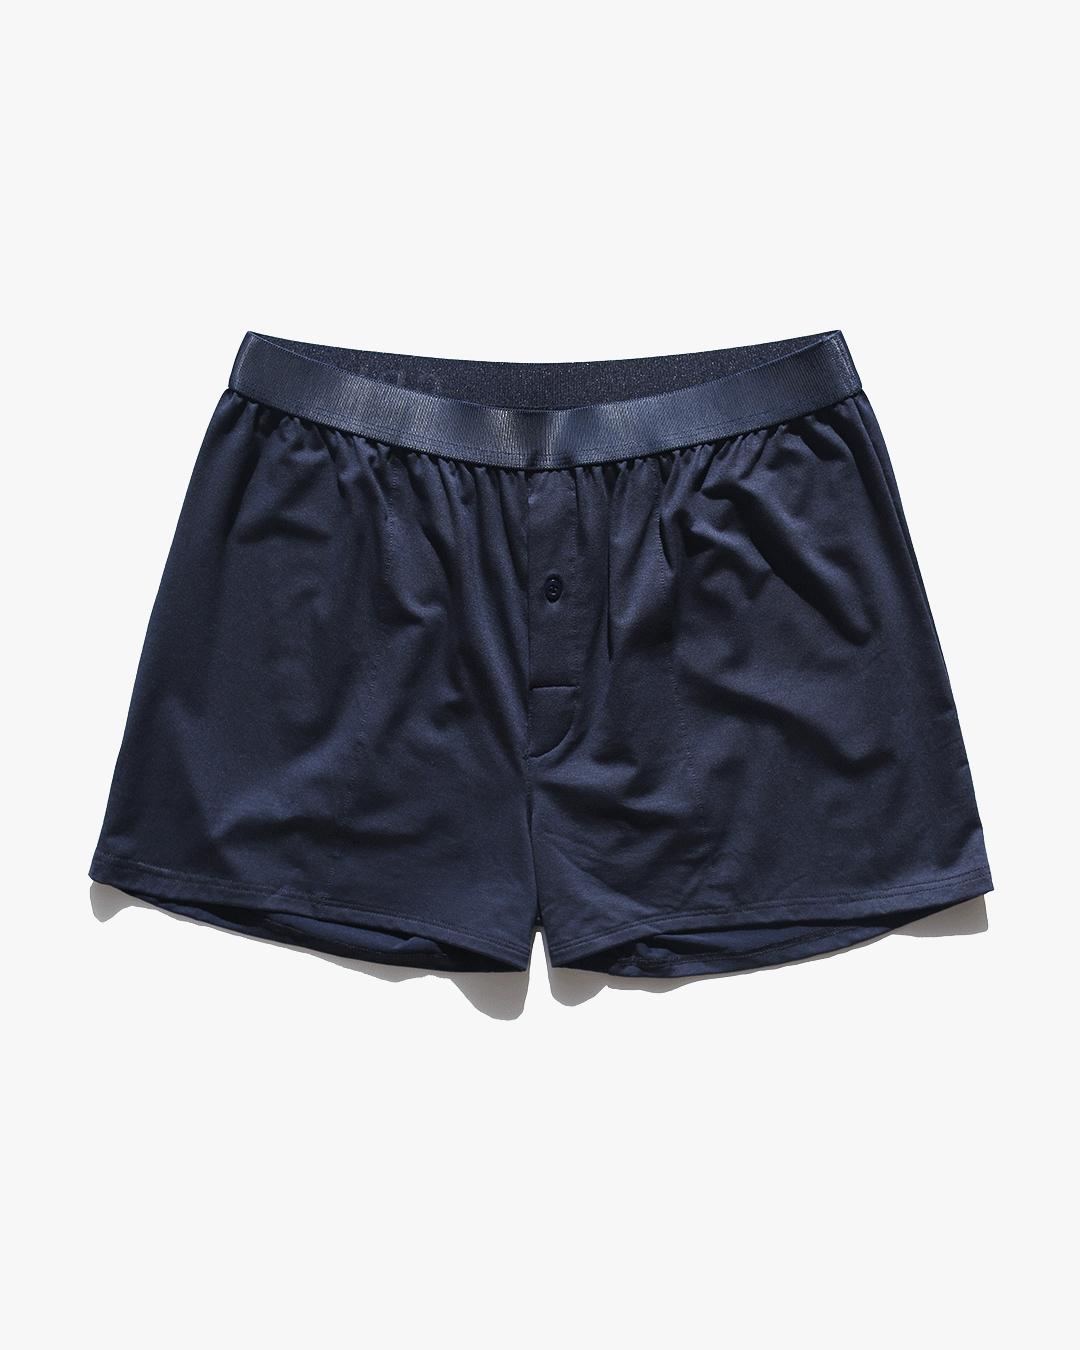 CDLP Boxer Shorts Navy Blue 1